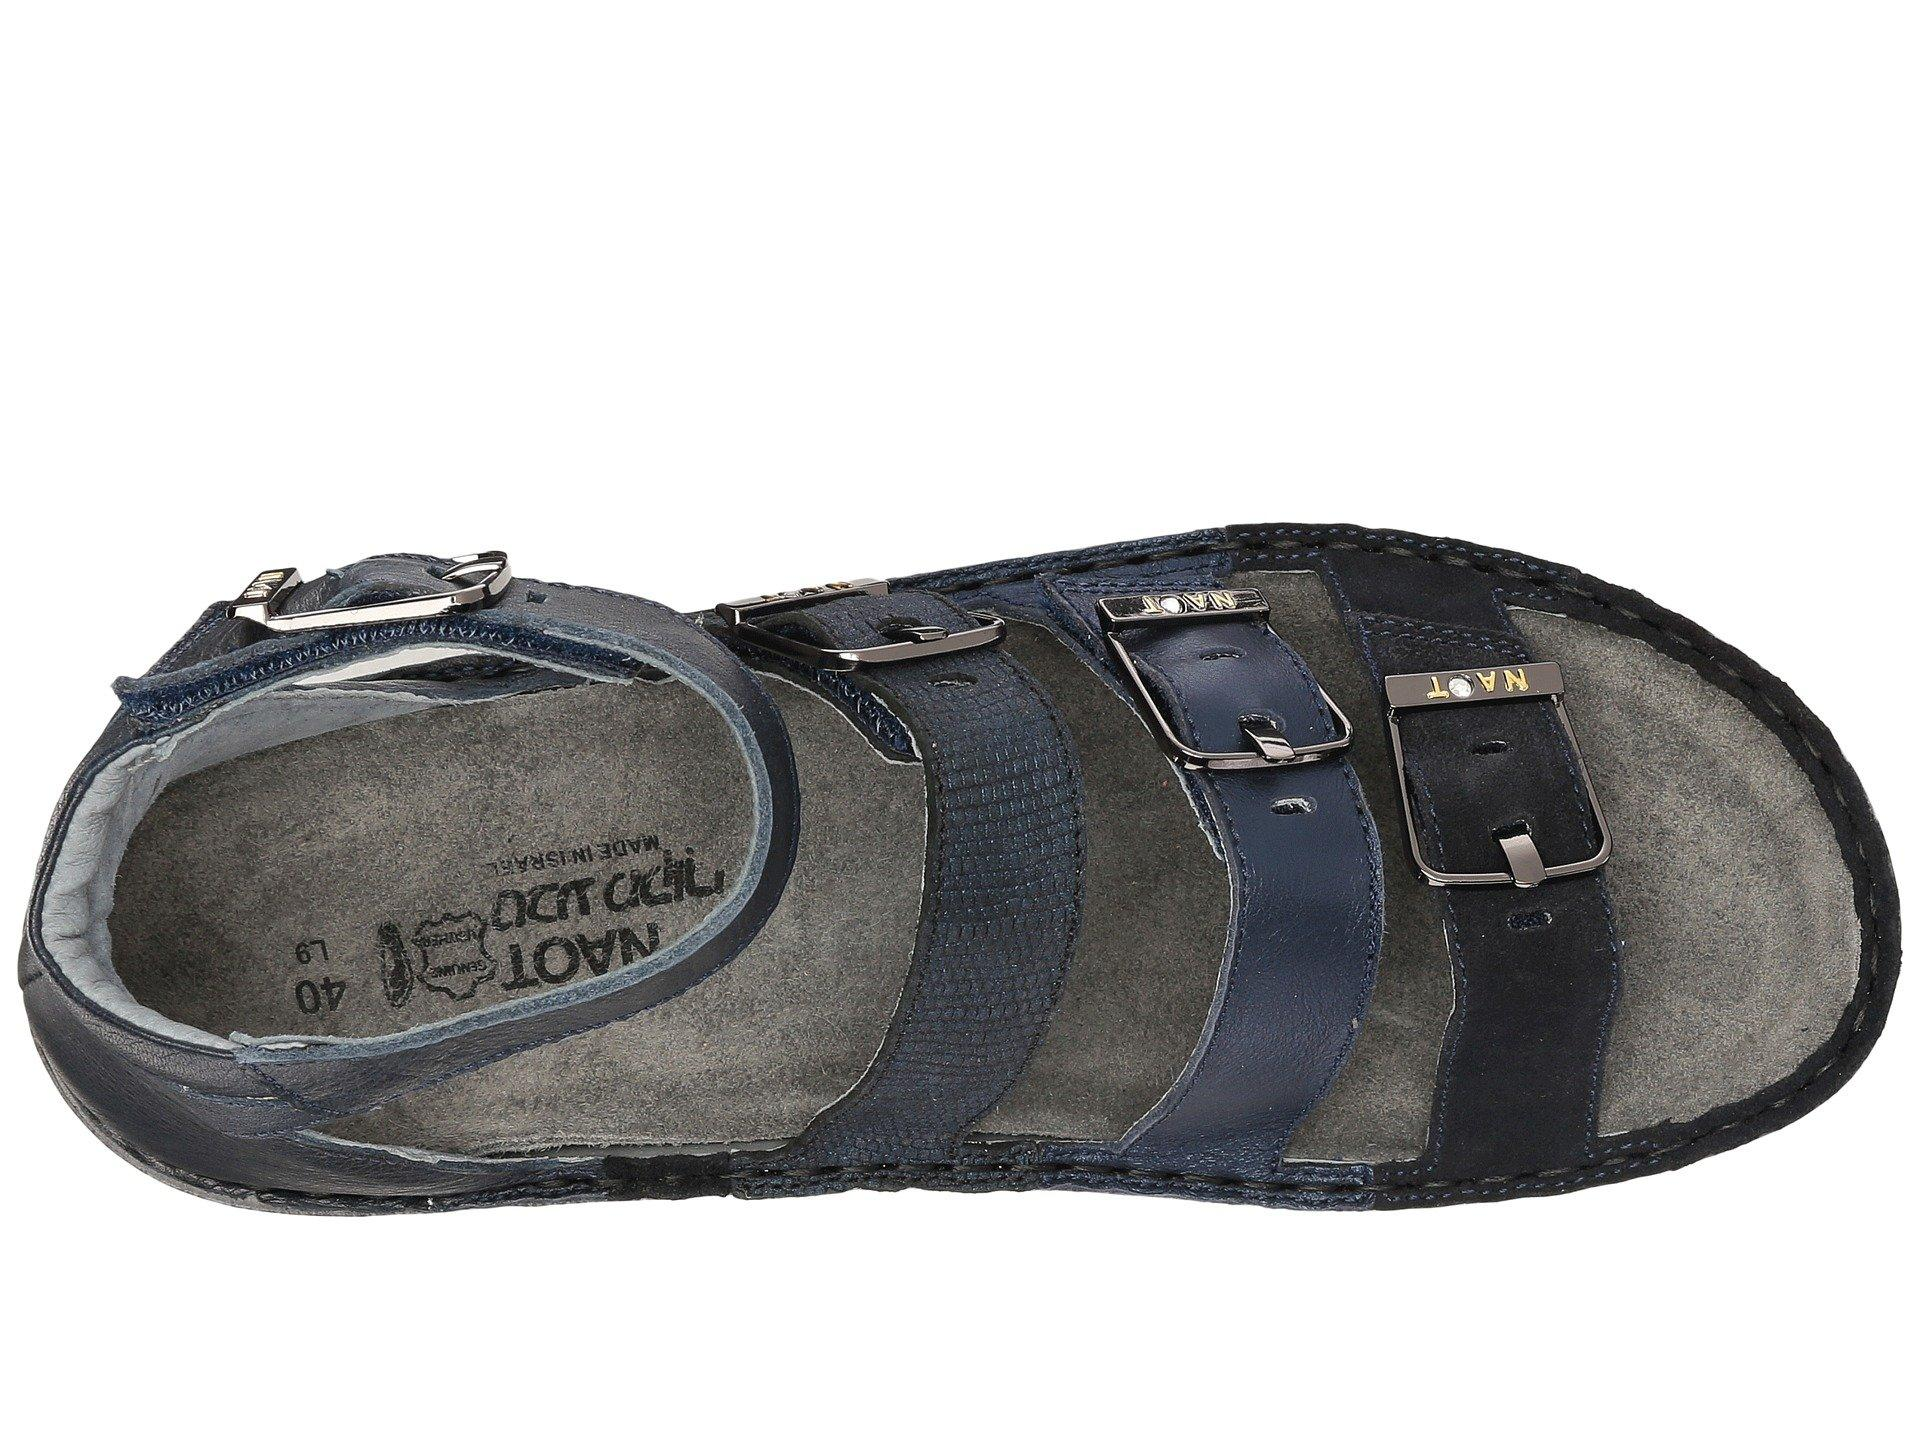 Naot Multicolor Begonia (black Velvet Nubuckmetallic Road Leatherblack Leather Combo) Women's Sandals